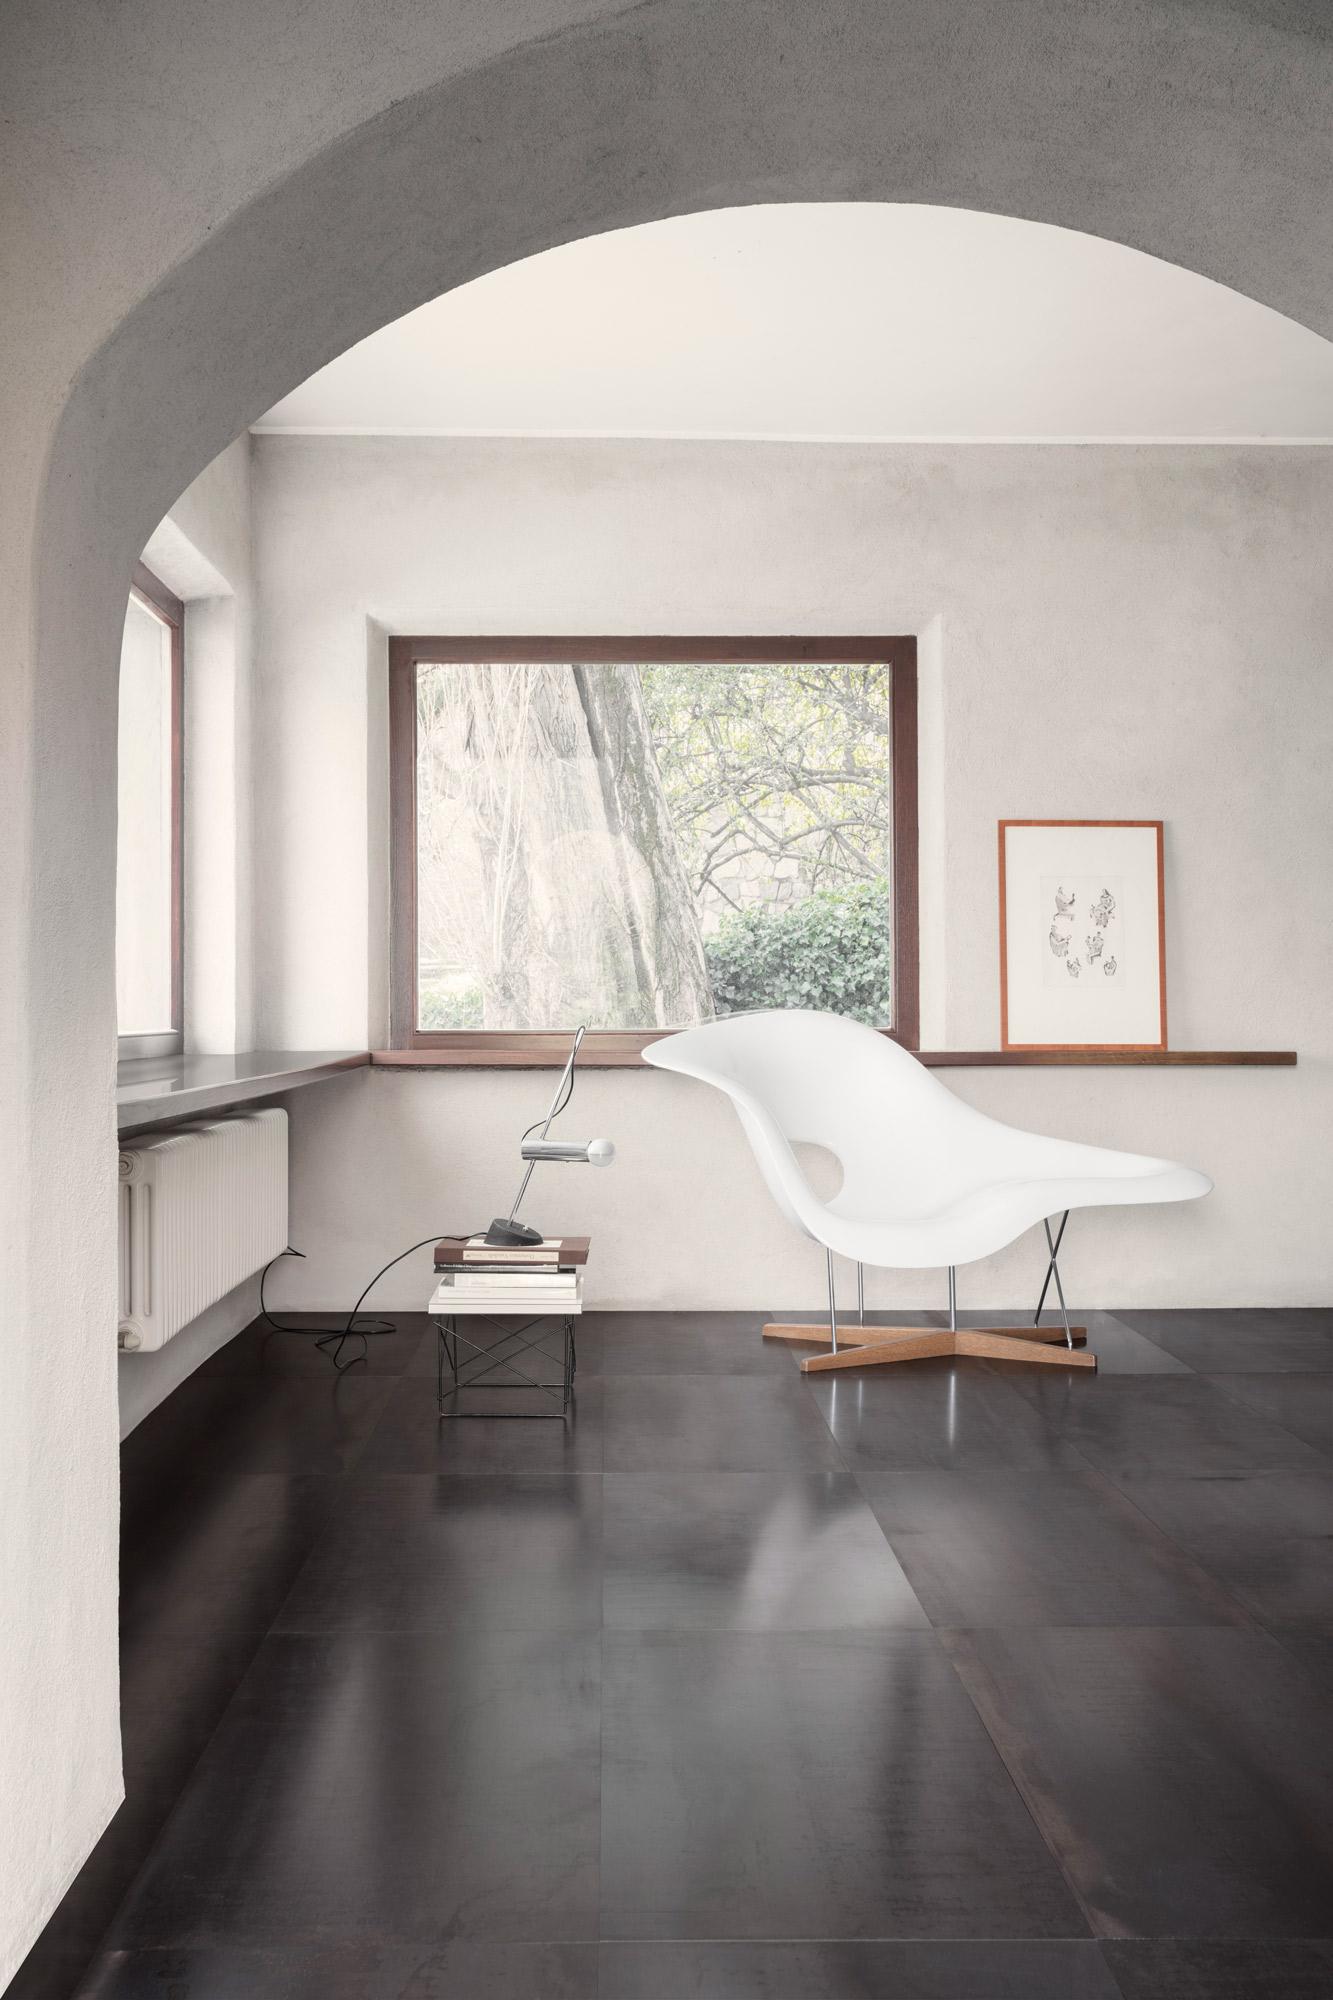 08_Lago-casetta-chair.jpg